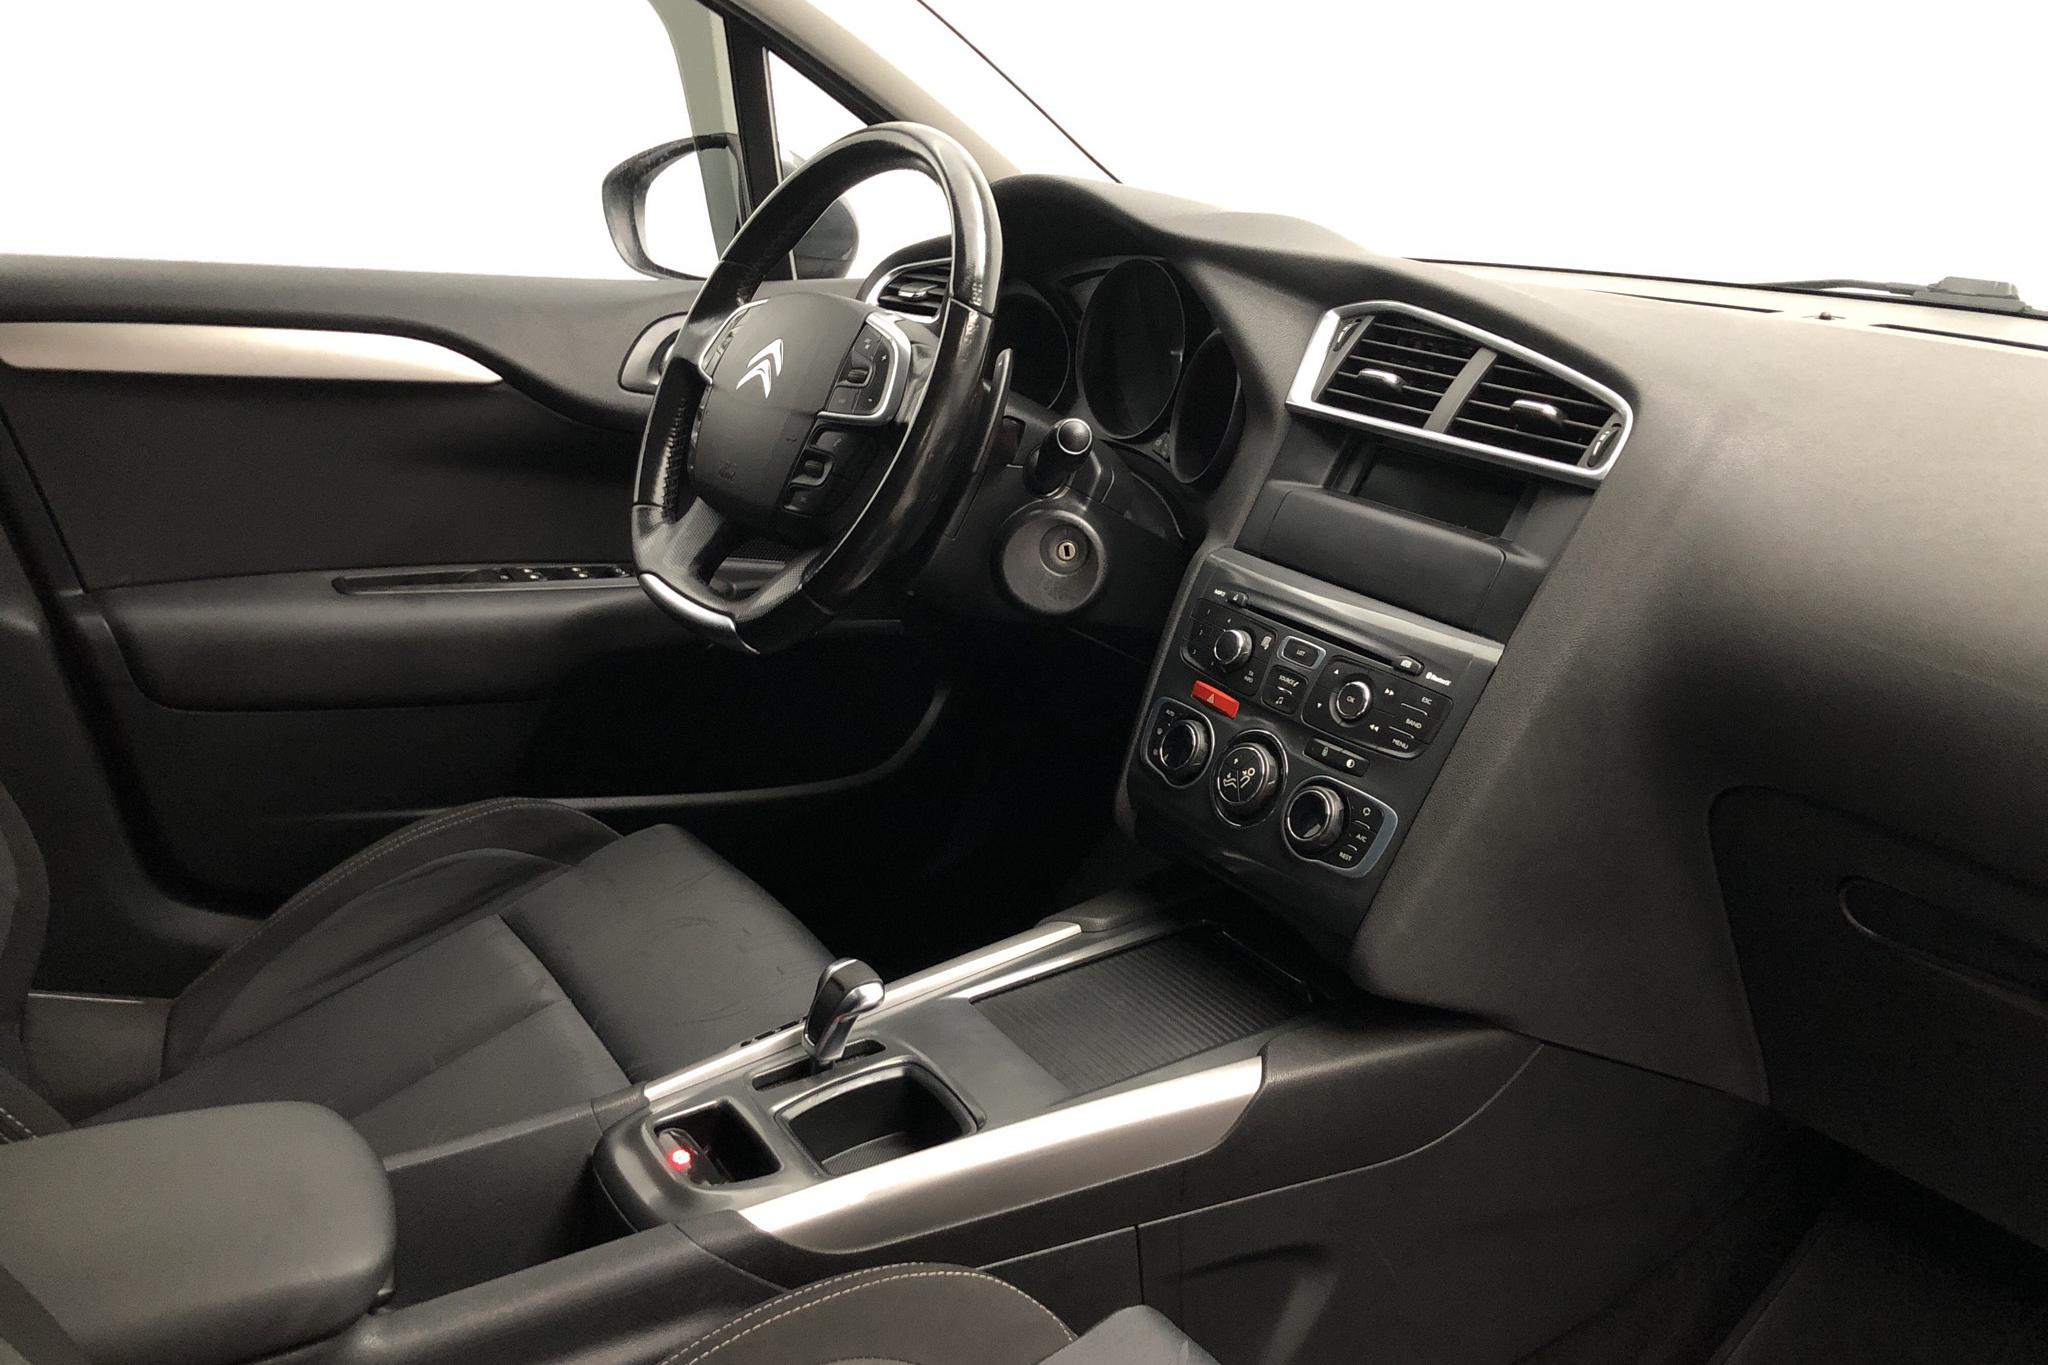 Citroen C4 1.6 HDi (110hk) - 211 770 km - Automatic - gray - 2011